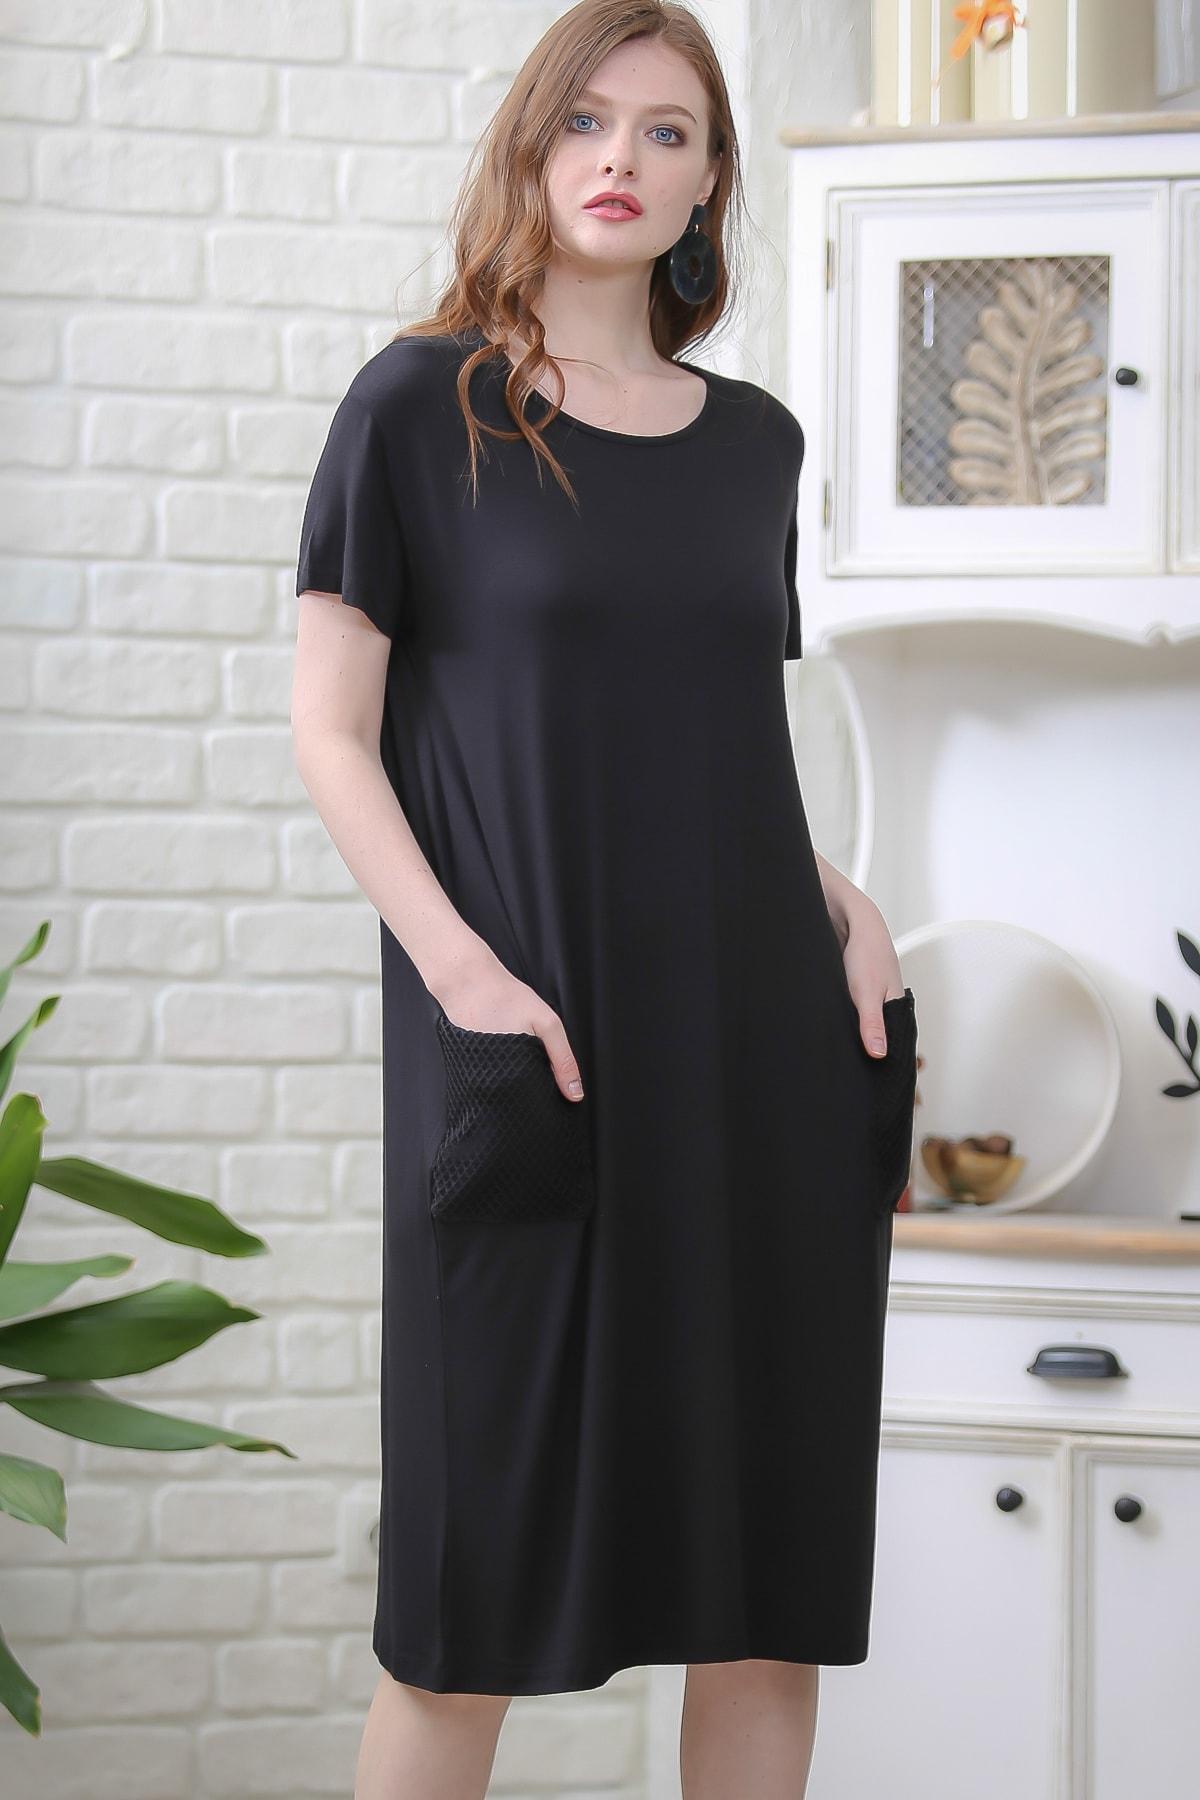 Chiccy Kadın Siyah Retro File Cep Detaylı Kısa Kollu Salaş Elbise M10160000EL97336 0